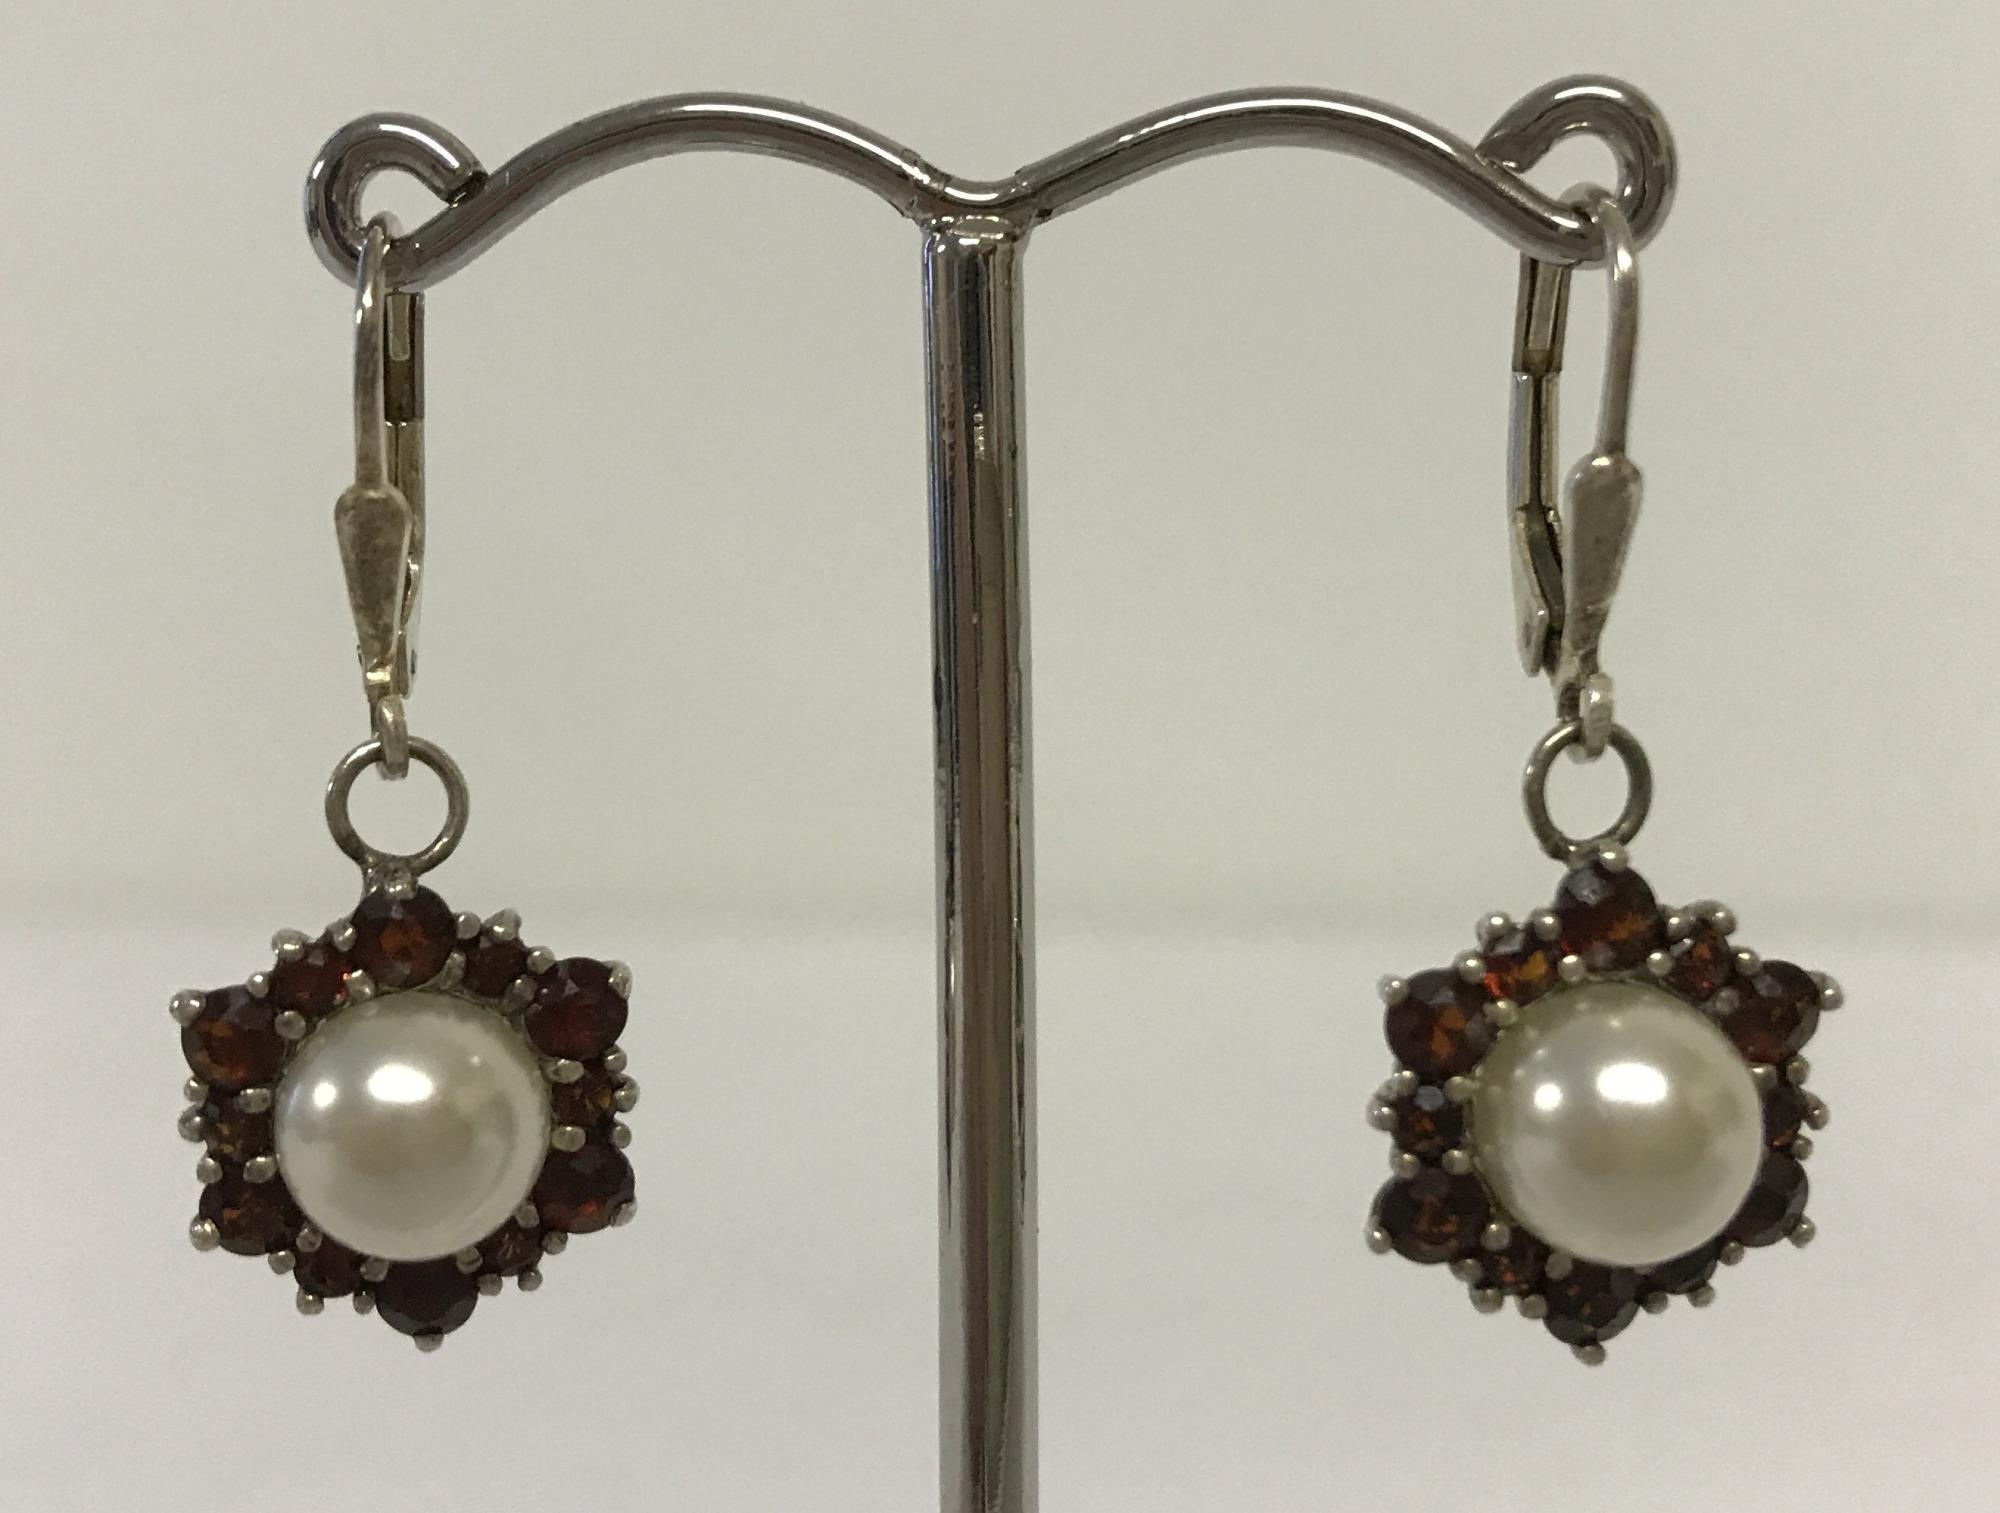 Lot 19 - A pair of faux pearl and garnet drop earrings.